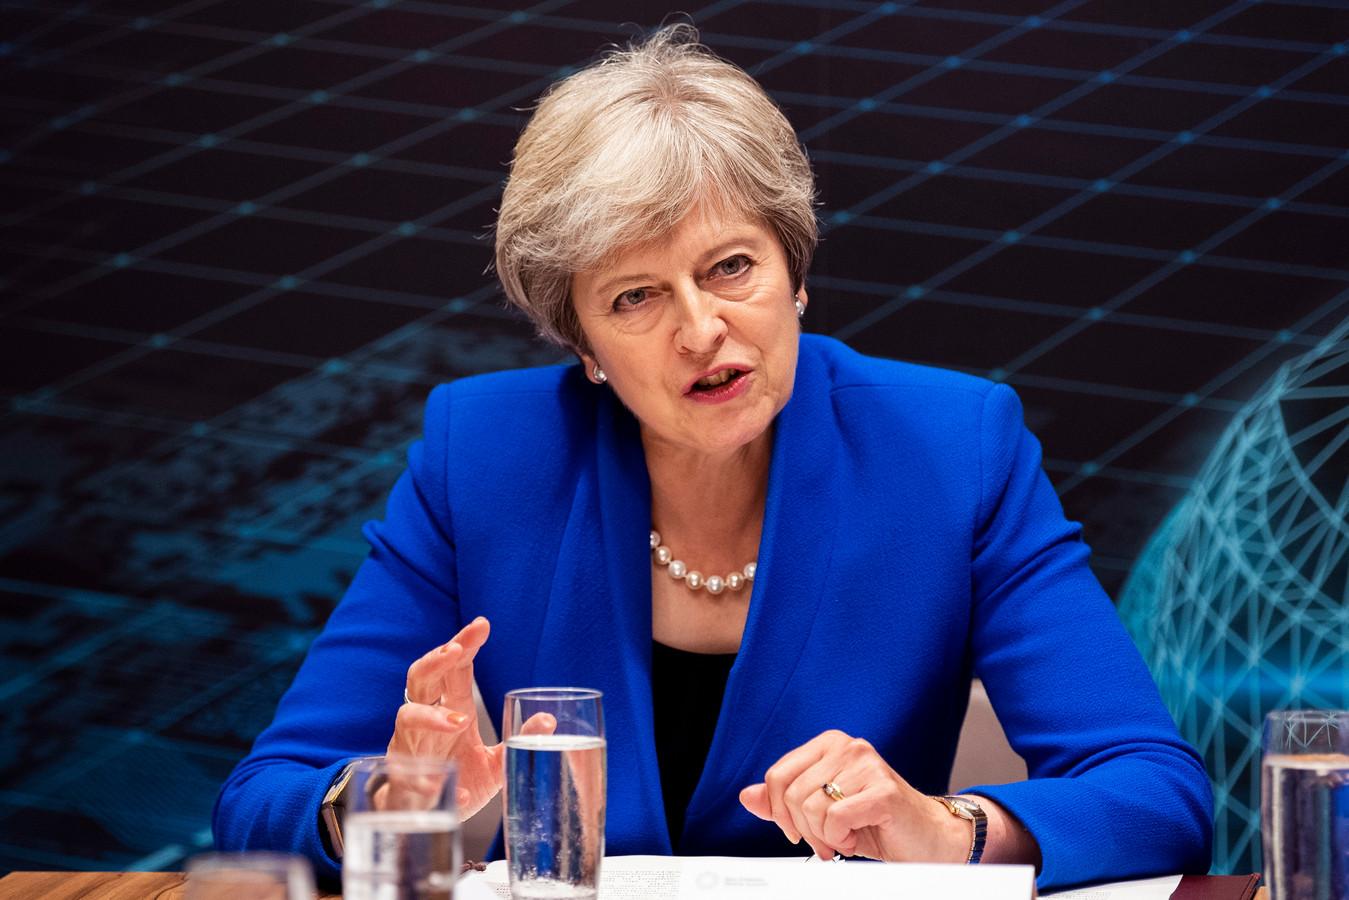 Theresa May op archiefbeeld